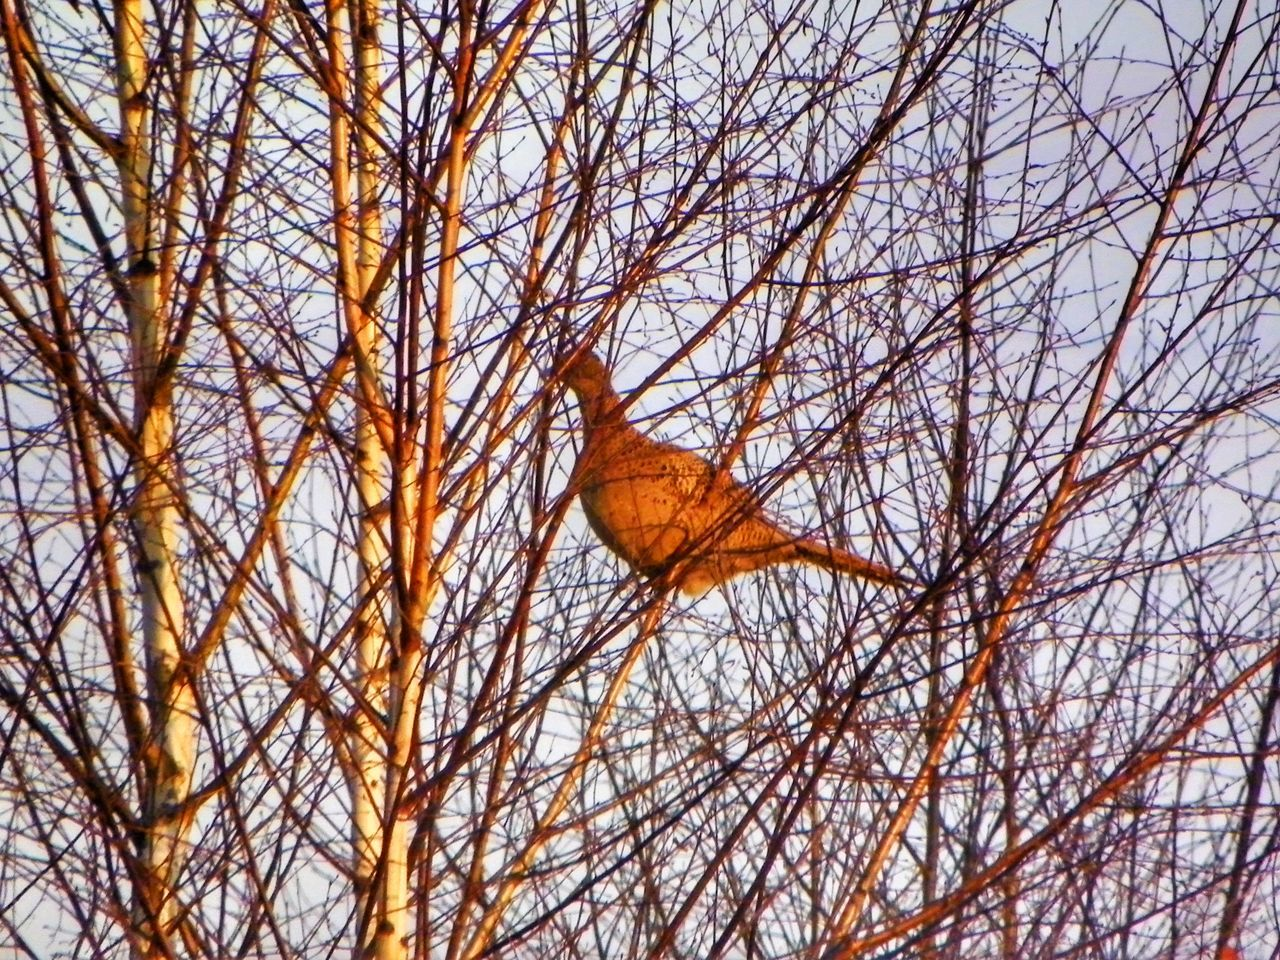 No People Day Beauty In Nature Sky Nature Tree Bird Branch Pheasant Animal One Animal Kodak Kodak Easyshare EyeEm Gallery Zimno Mróz Sarzyna Polska Eyeemphoto Podkarpacie Nature Ptak Bazant Brzoza Tree